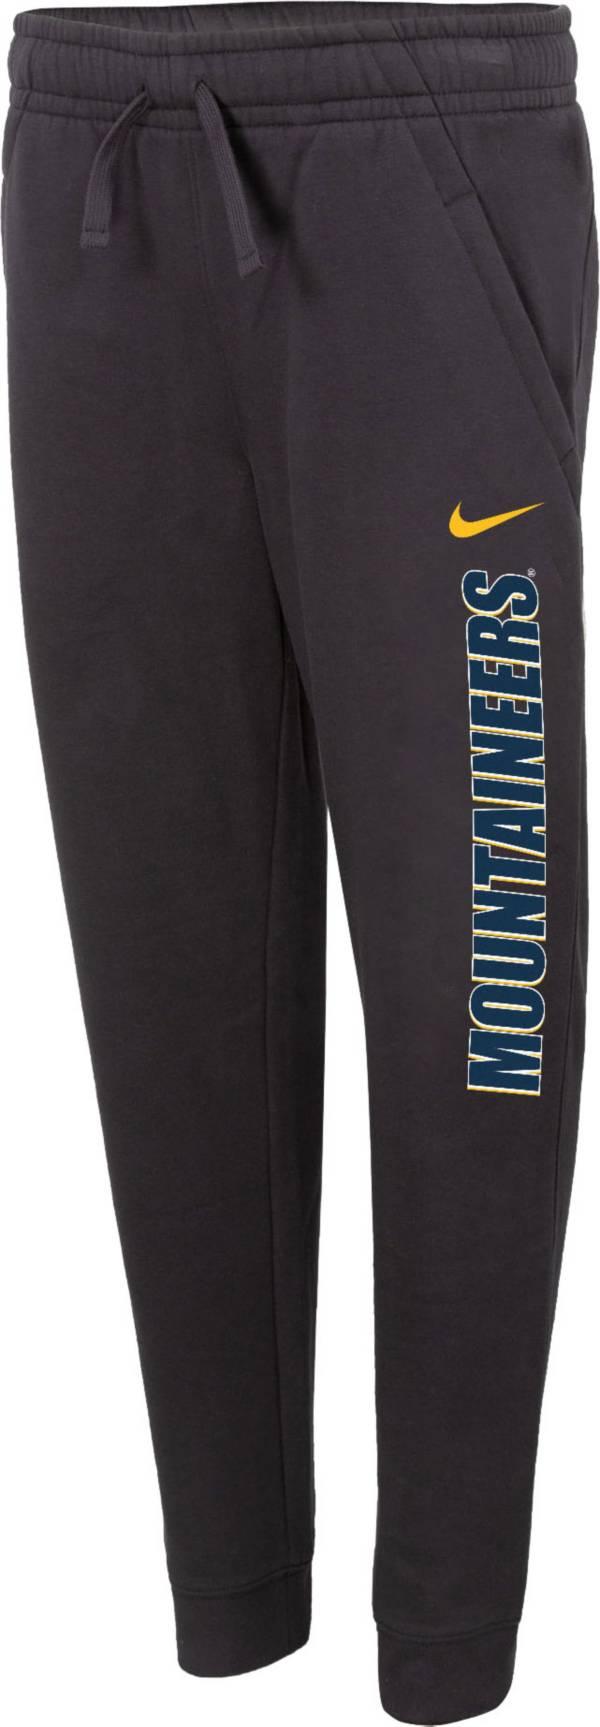 Nike Youth West Virginia Mountaineers Grey Club Fleece Joggers product image